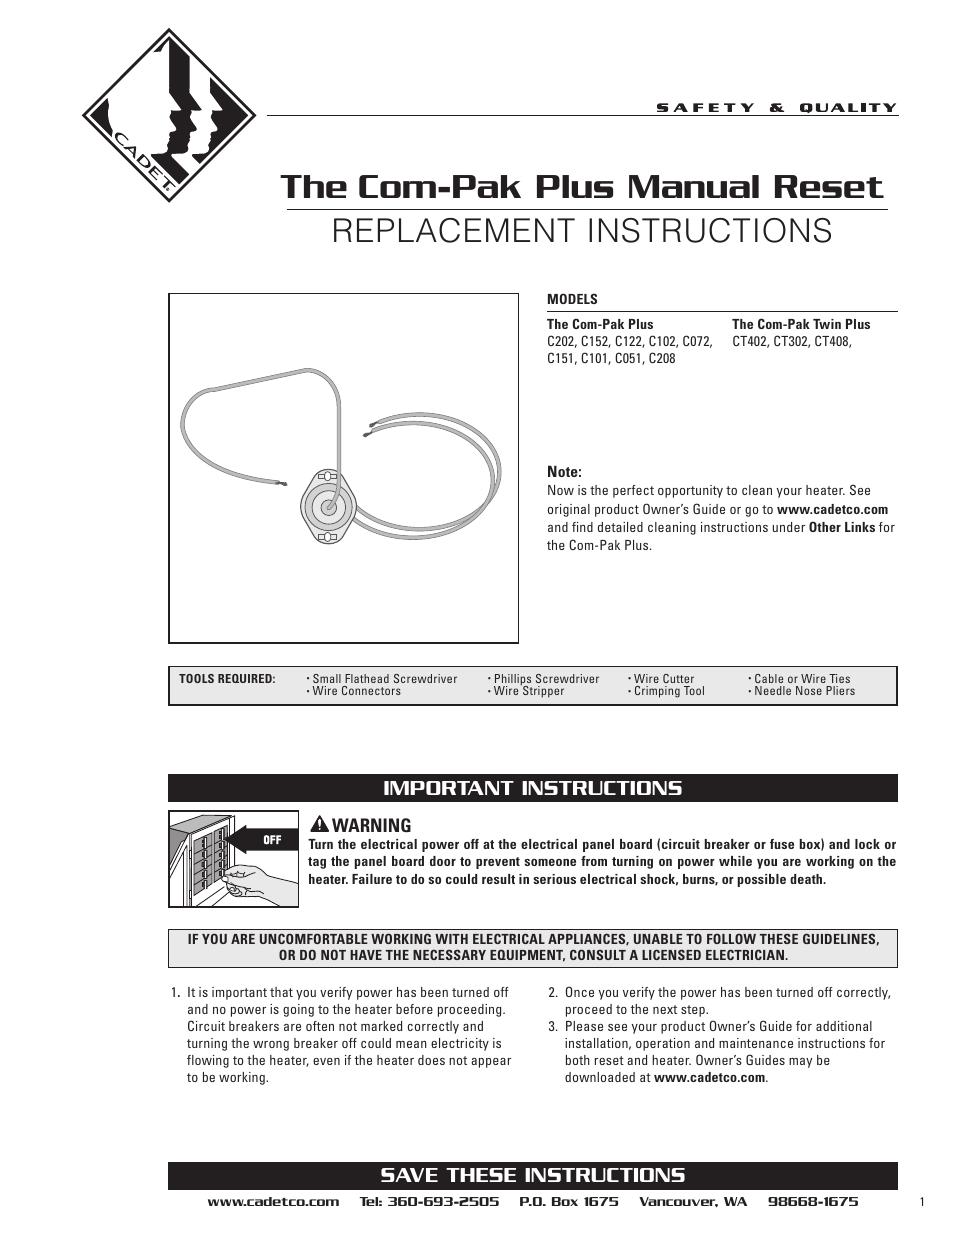 Cadet Ct408 User Manual 2 Pages Also For C208 C202 C102 Step 1 Turn Off Power At Circuit Breaker Ct402 Ct302 C101 C122 C152 C051 C072 C151